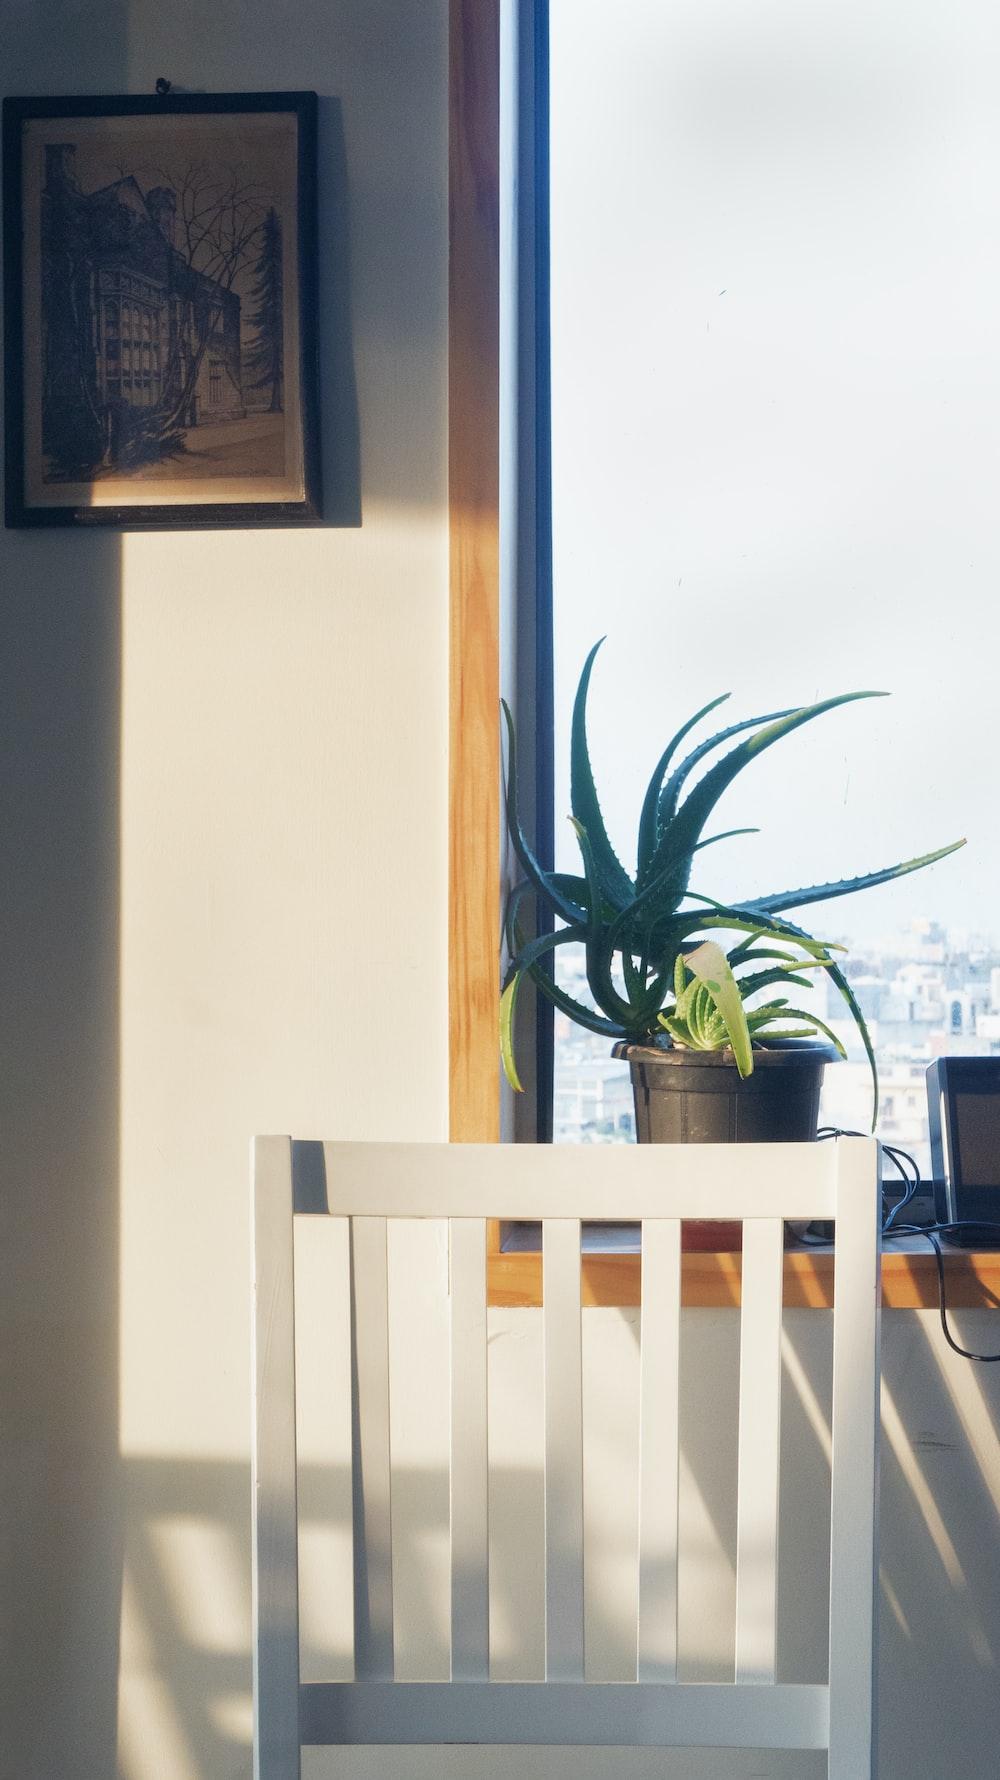 plant on window